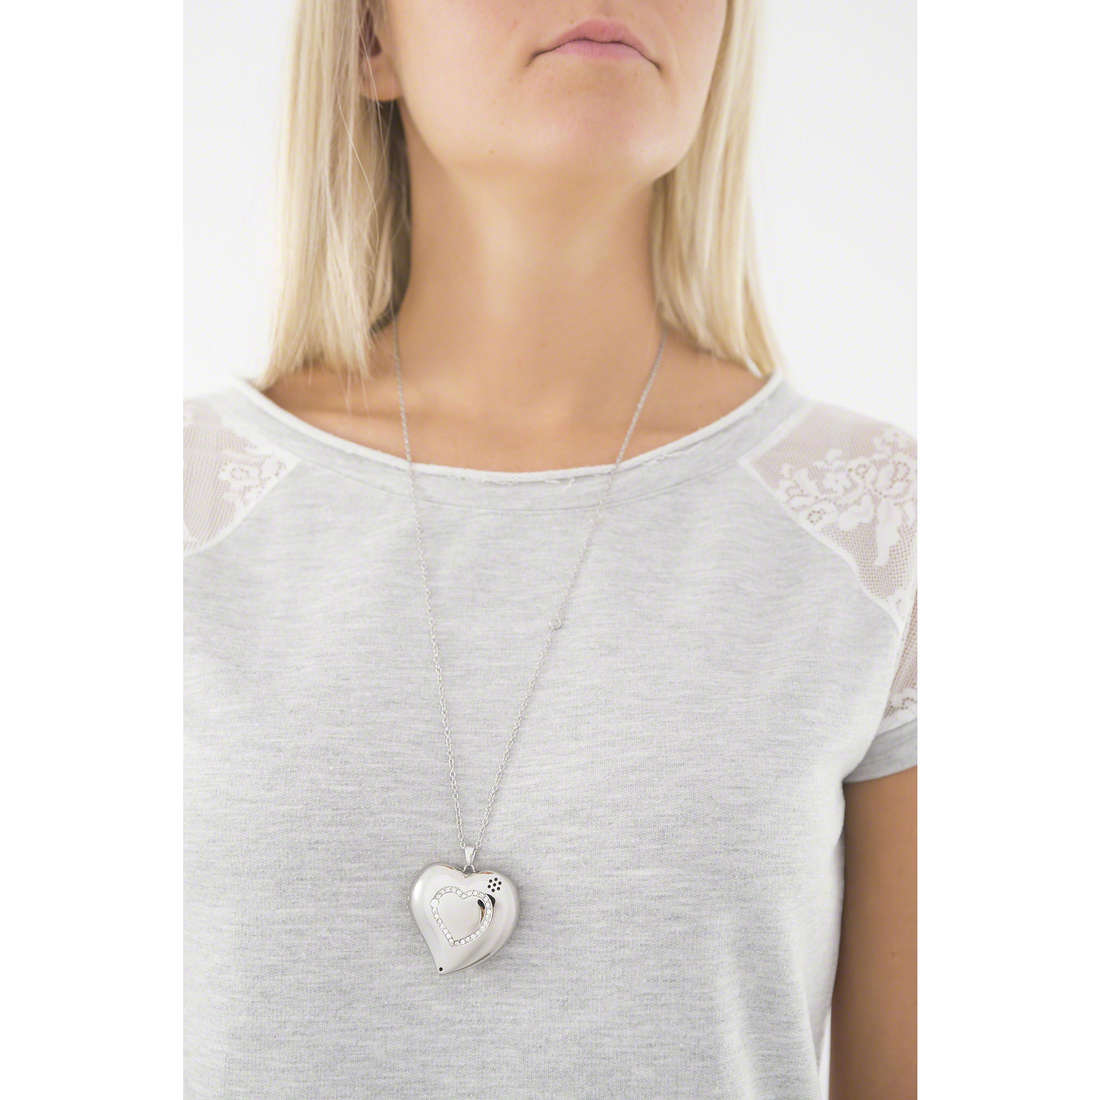 Morellato collane Smart Jewel donna SAEW01 indosso